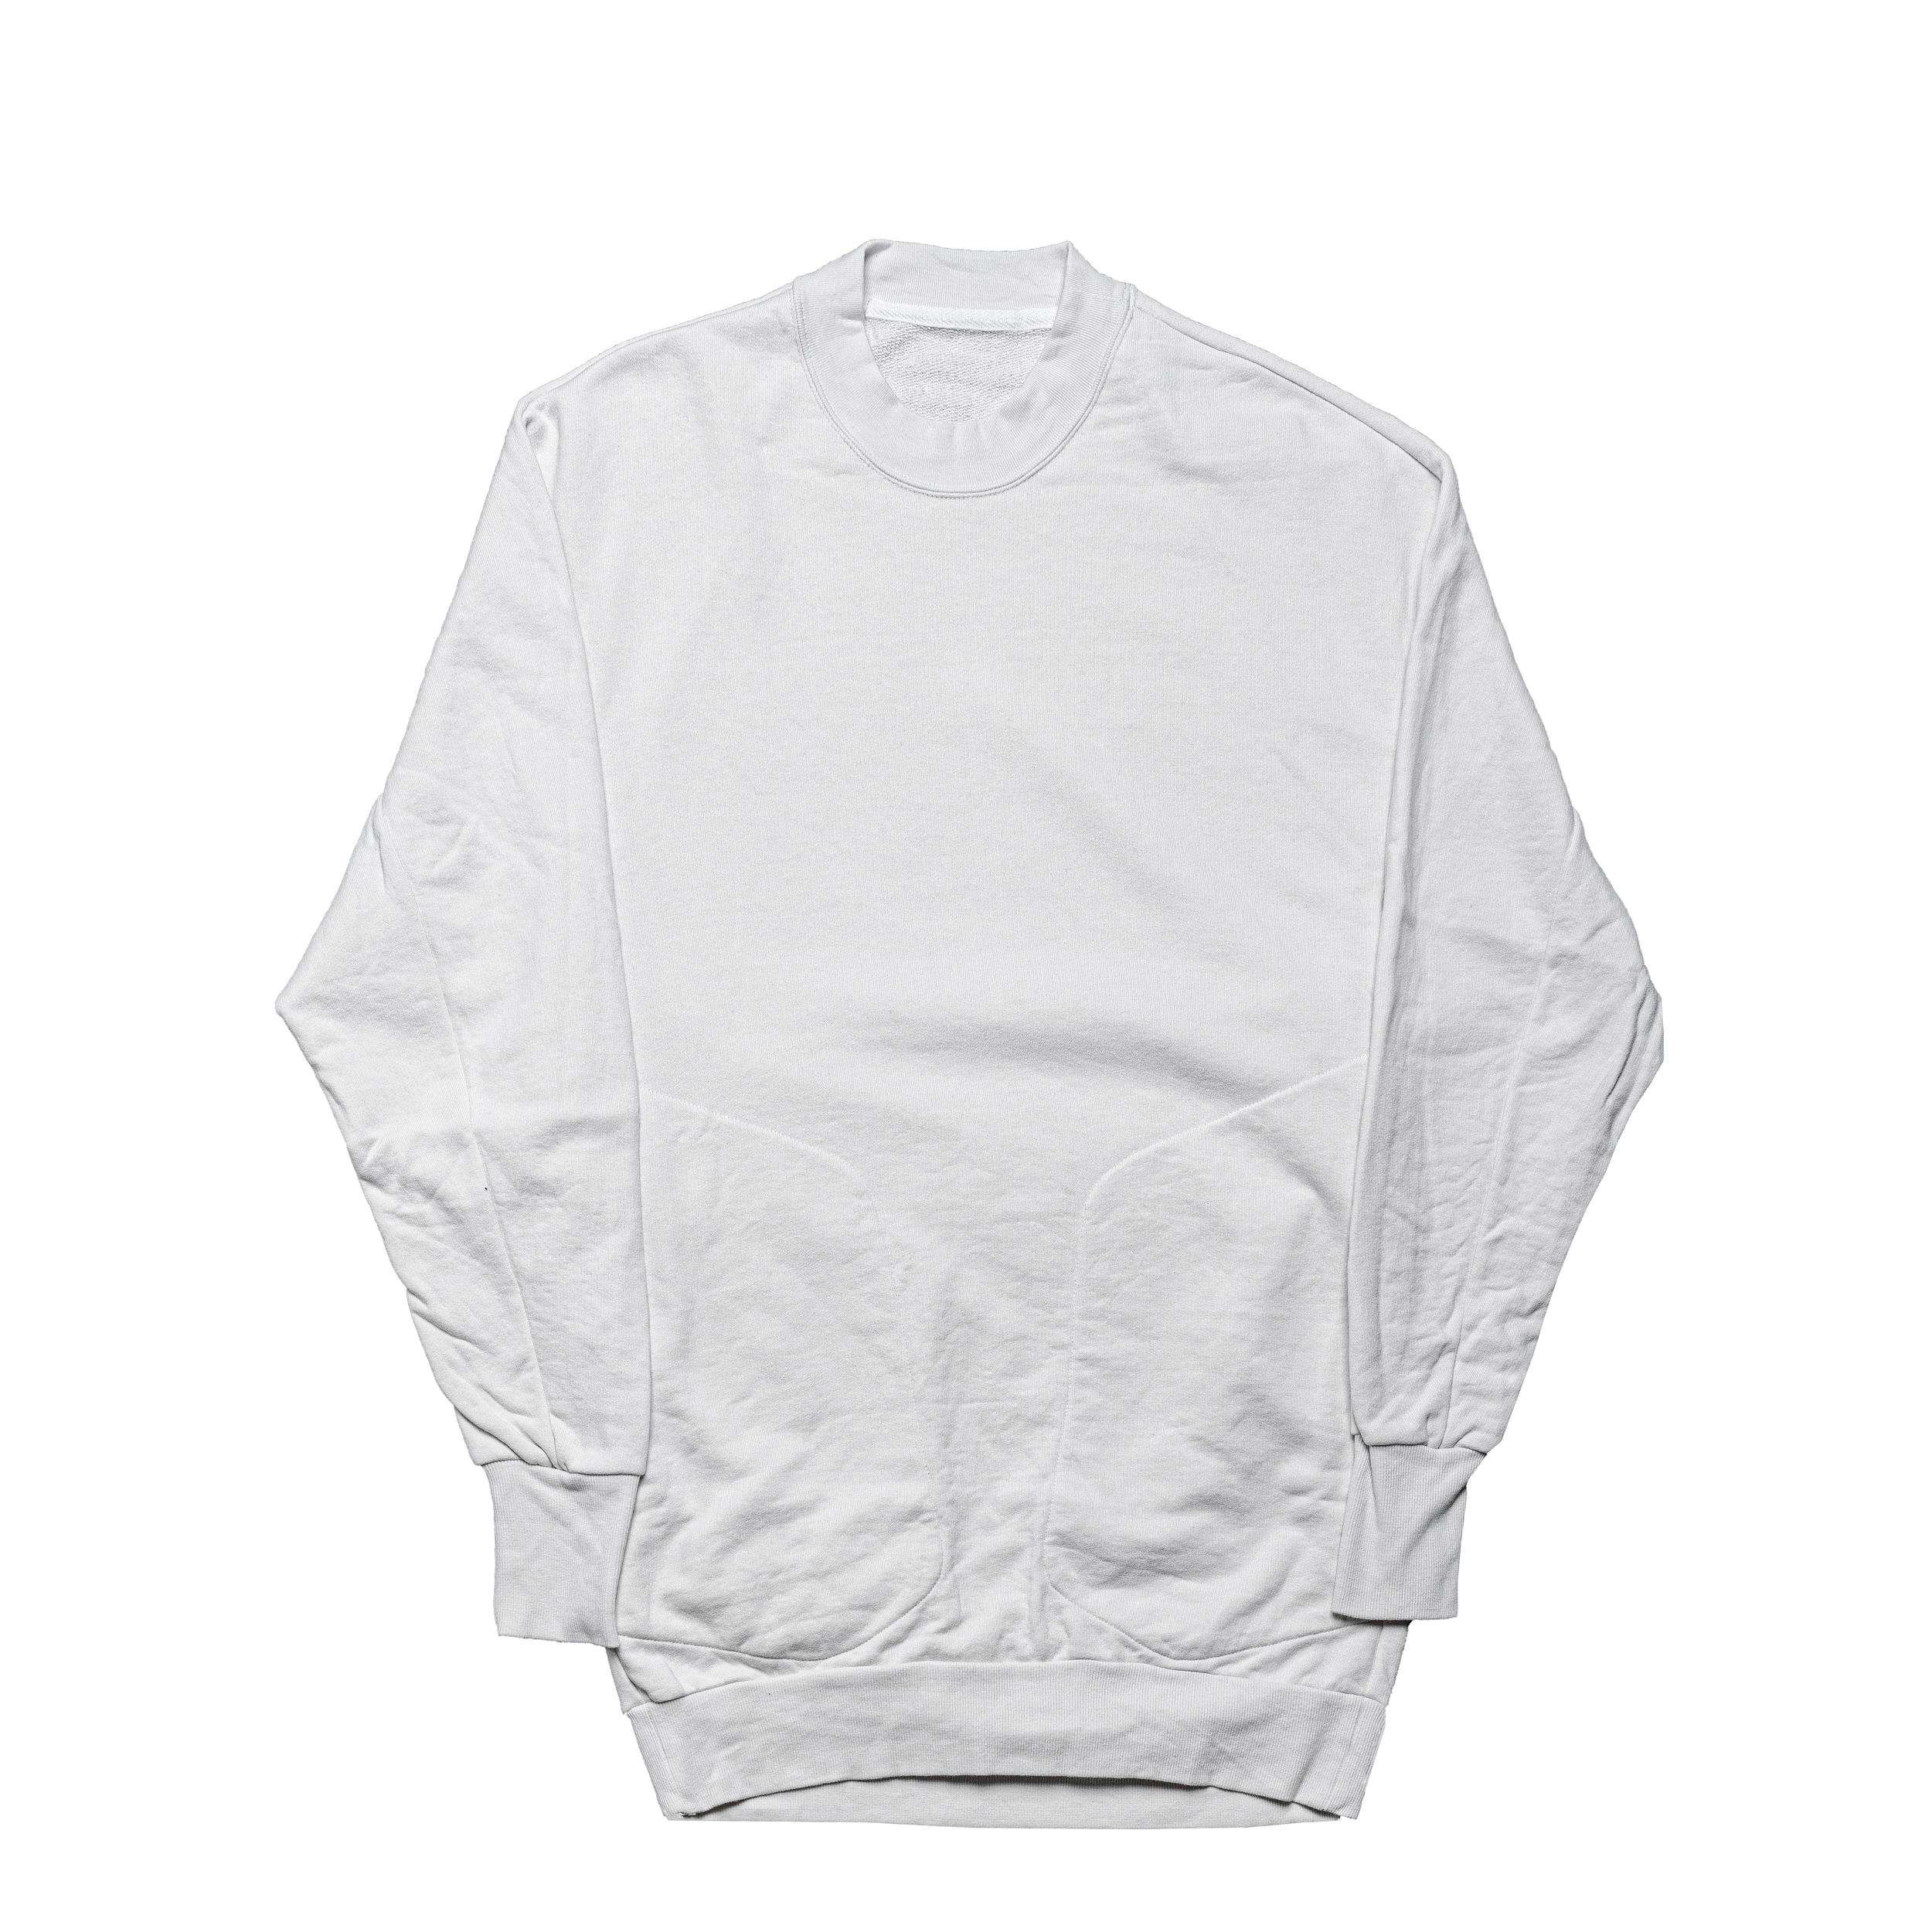 677CUM3-PLASTER / BIGスウェットシャツジャケット